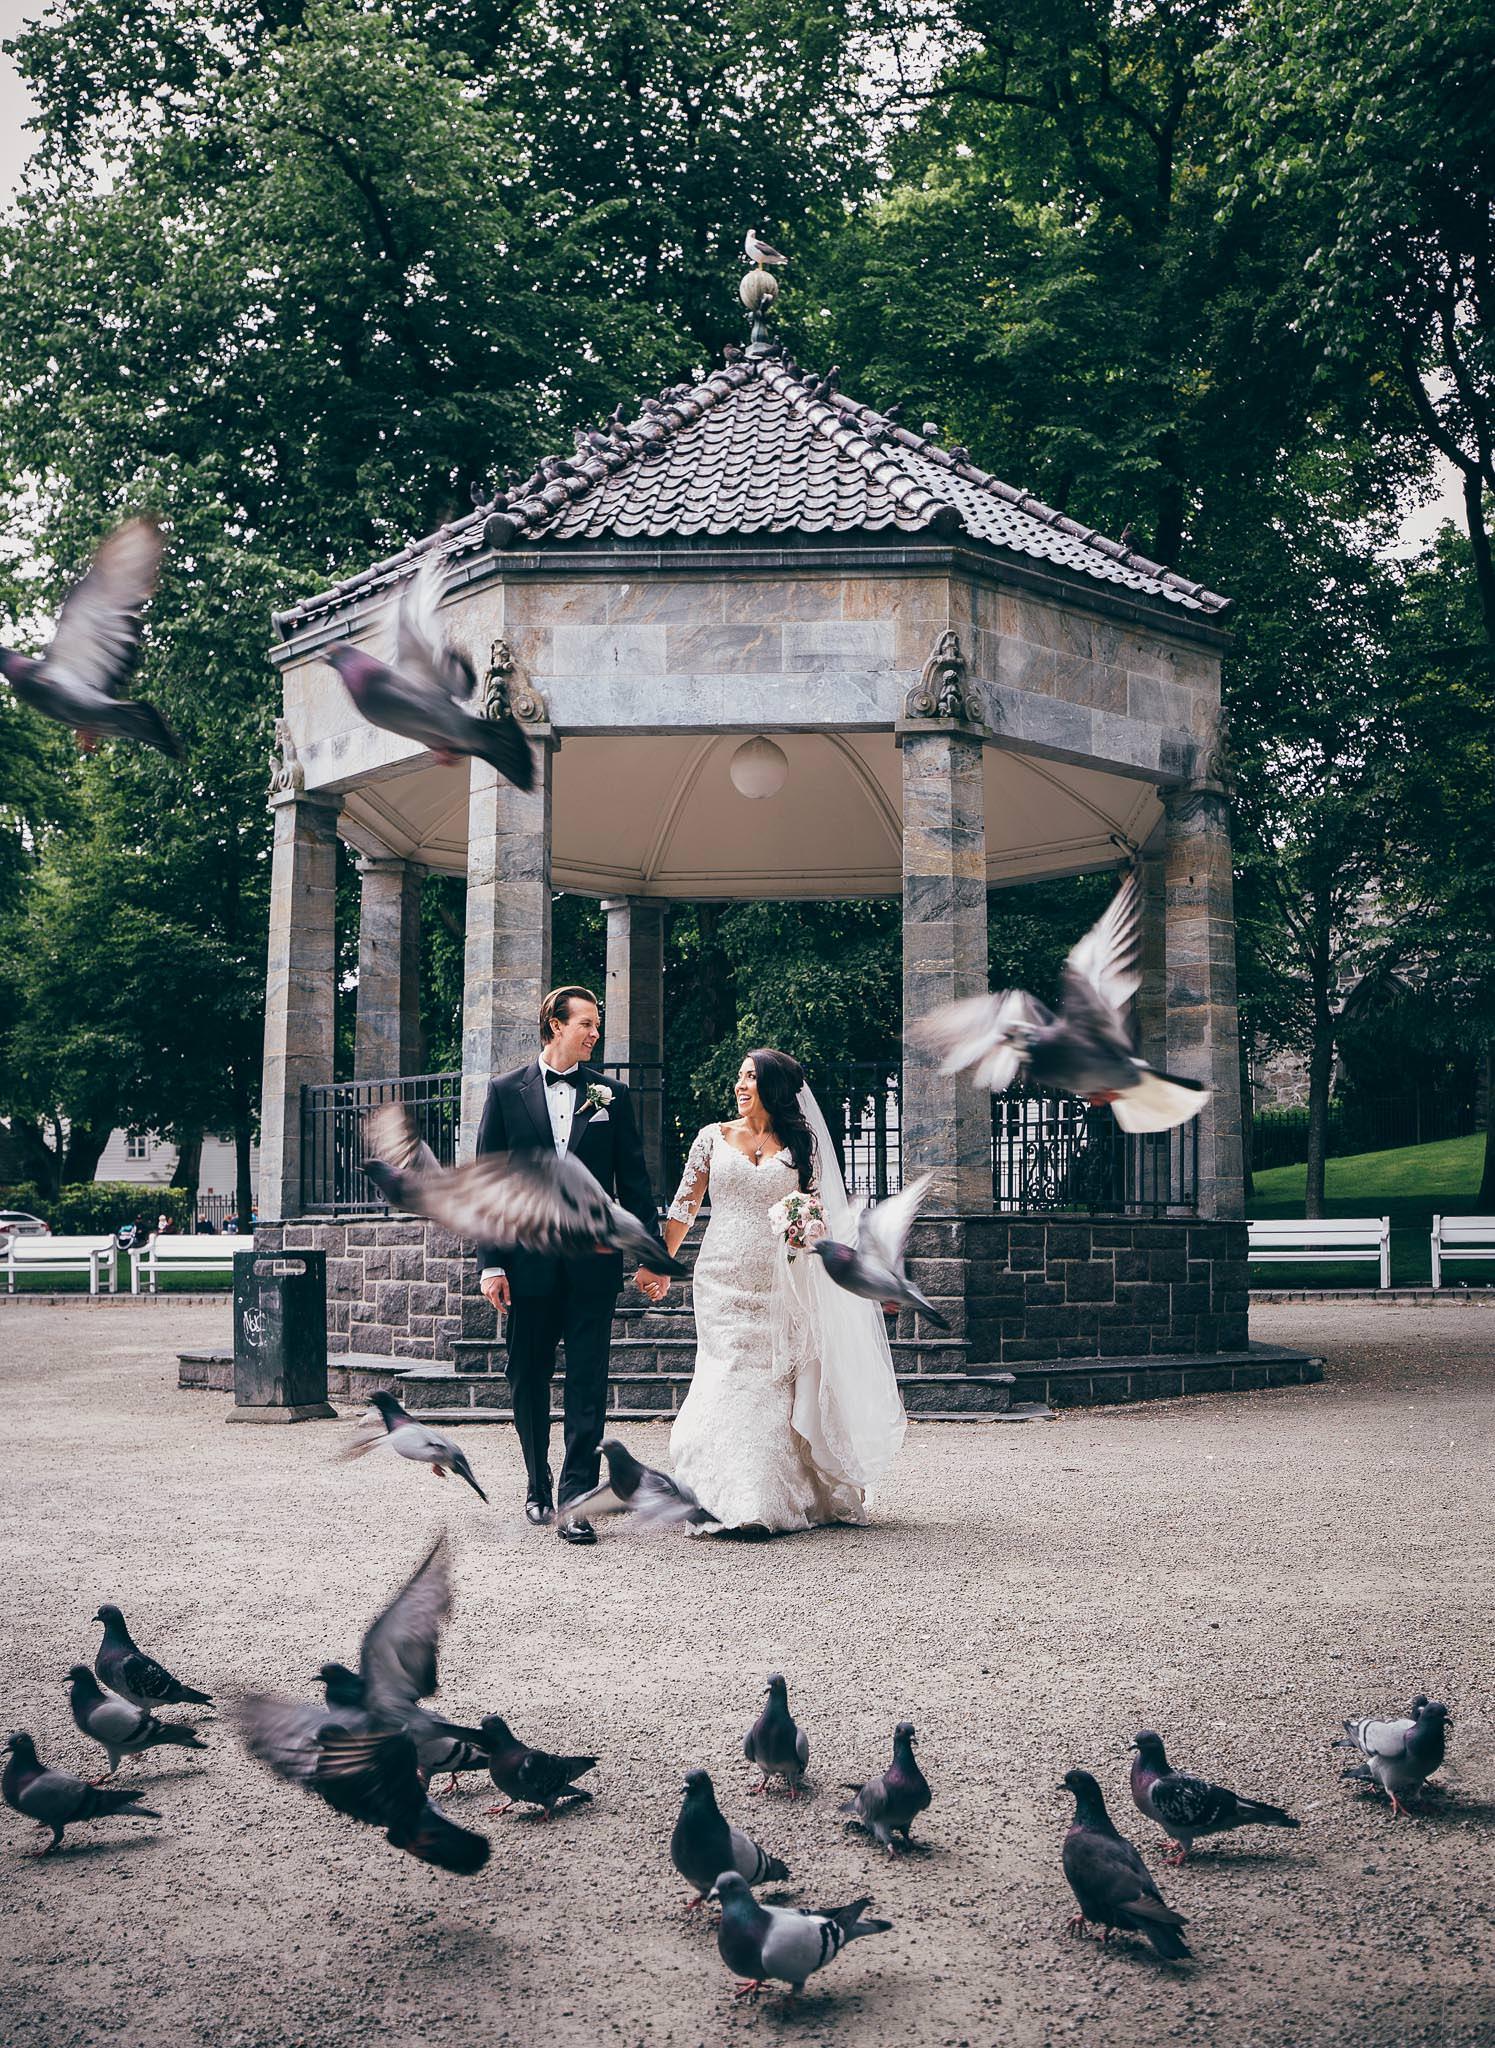 Wedding+Photographer+Norway+Bryllupsfotograf+Casey+Arneson+MK-153.jpg